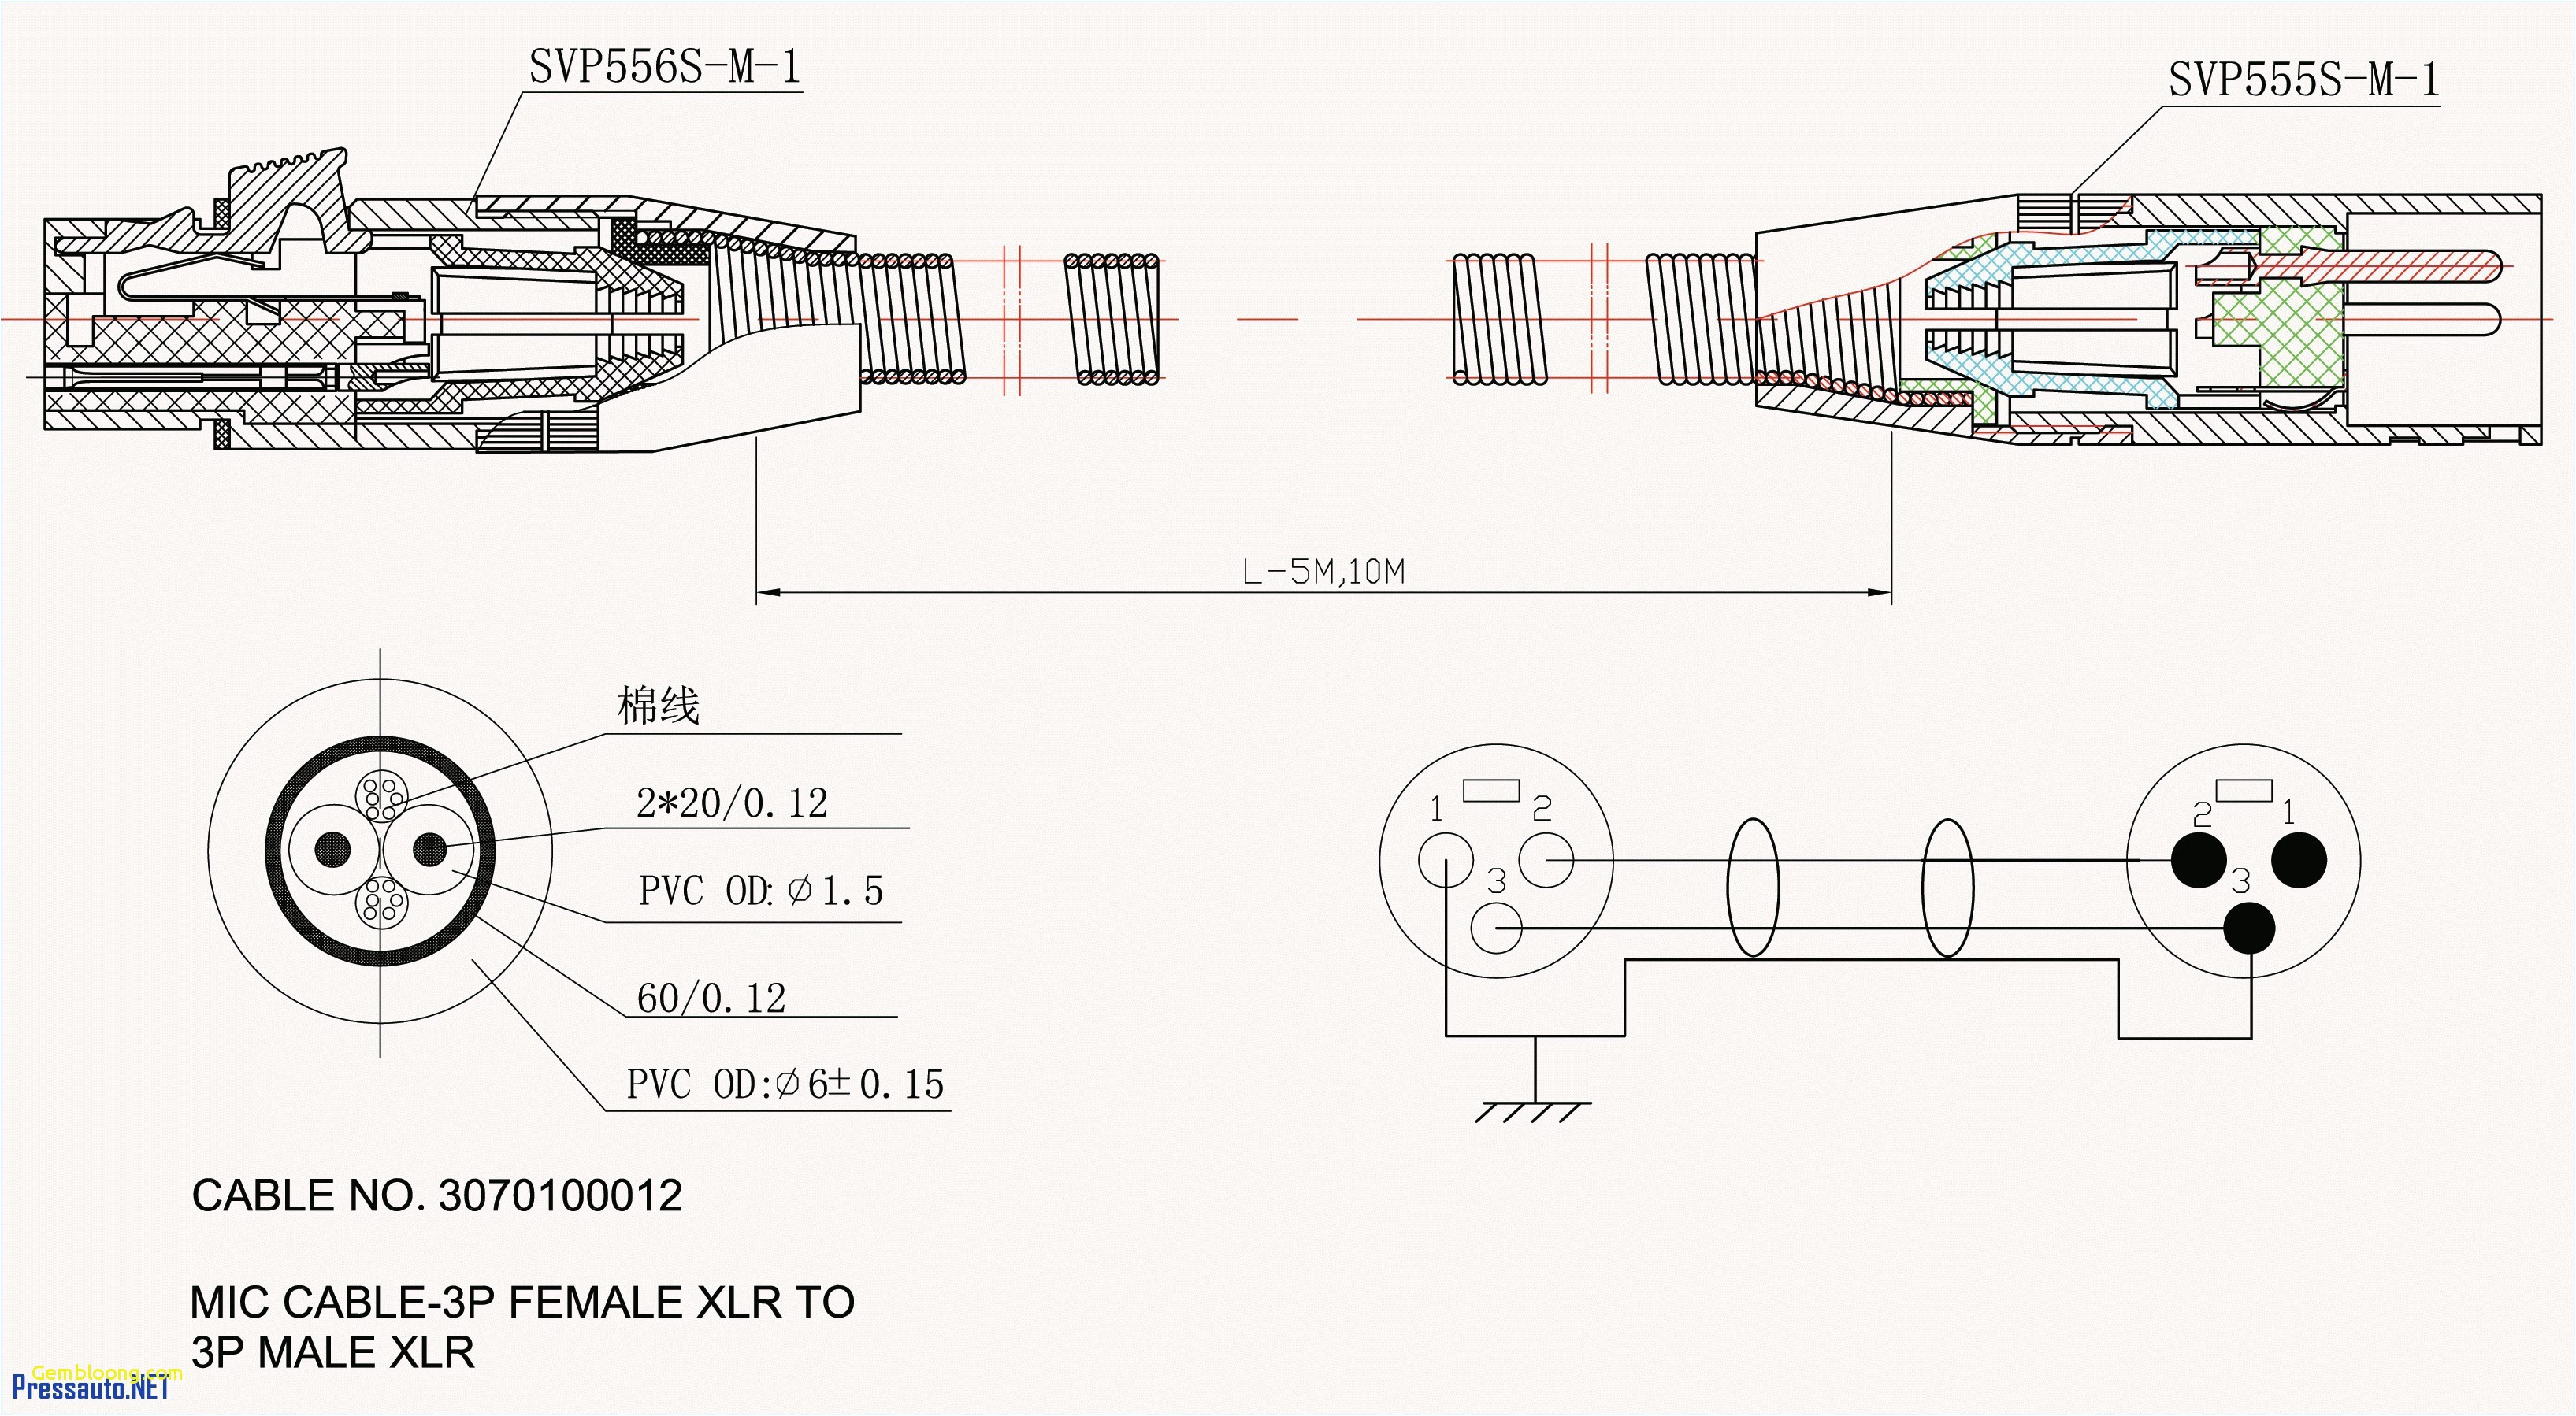 98 e36 wiring diagram wiring diagram page audi 4000cs fuse box diagram 86